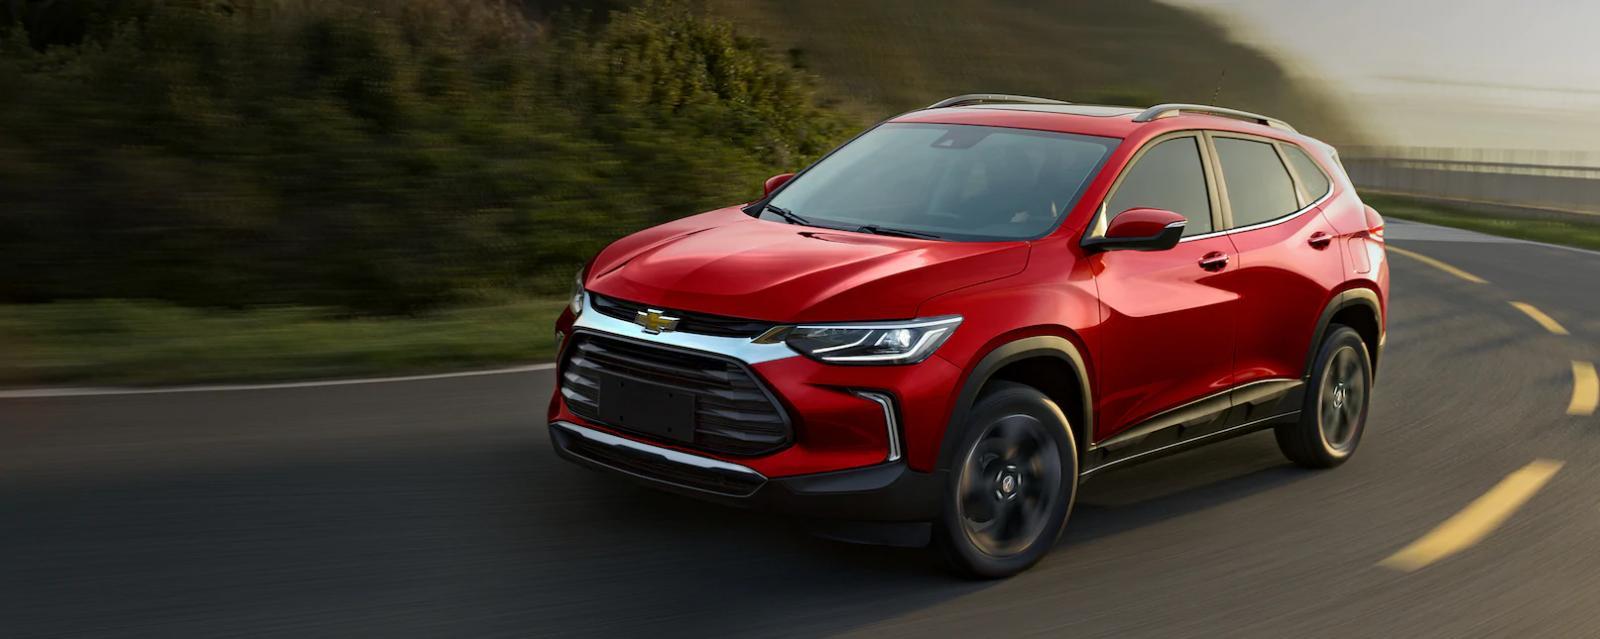 Chevrolet Tracker precio mexico